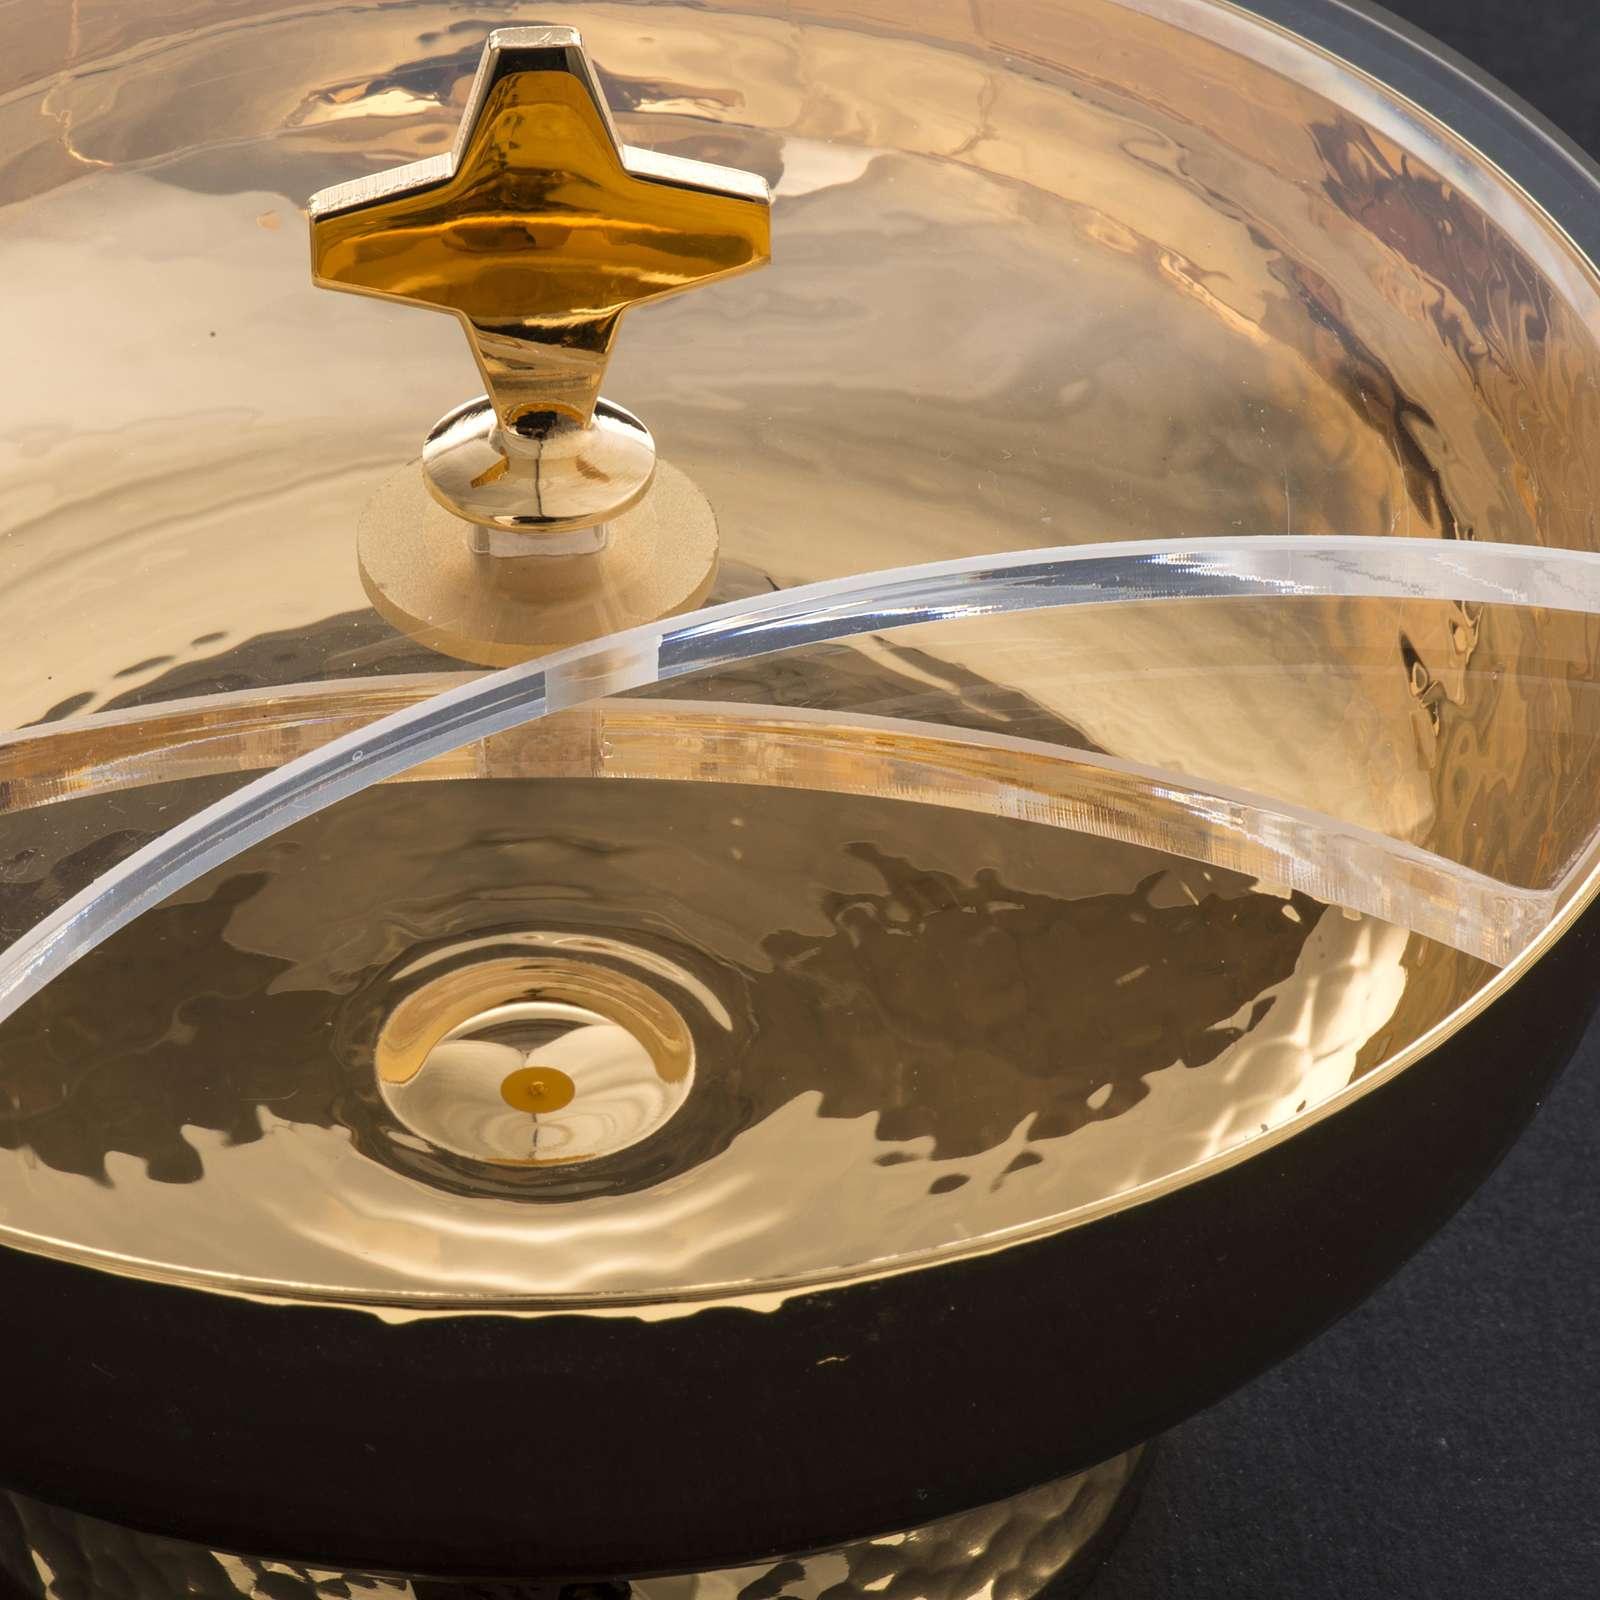 Ziborium aus vergoldetem Messing mit drehbaren Plexiglas-Deckel 4